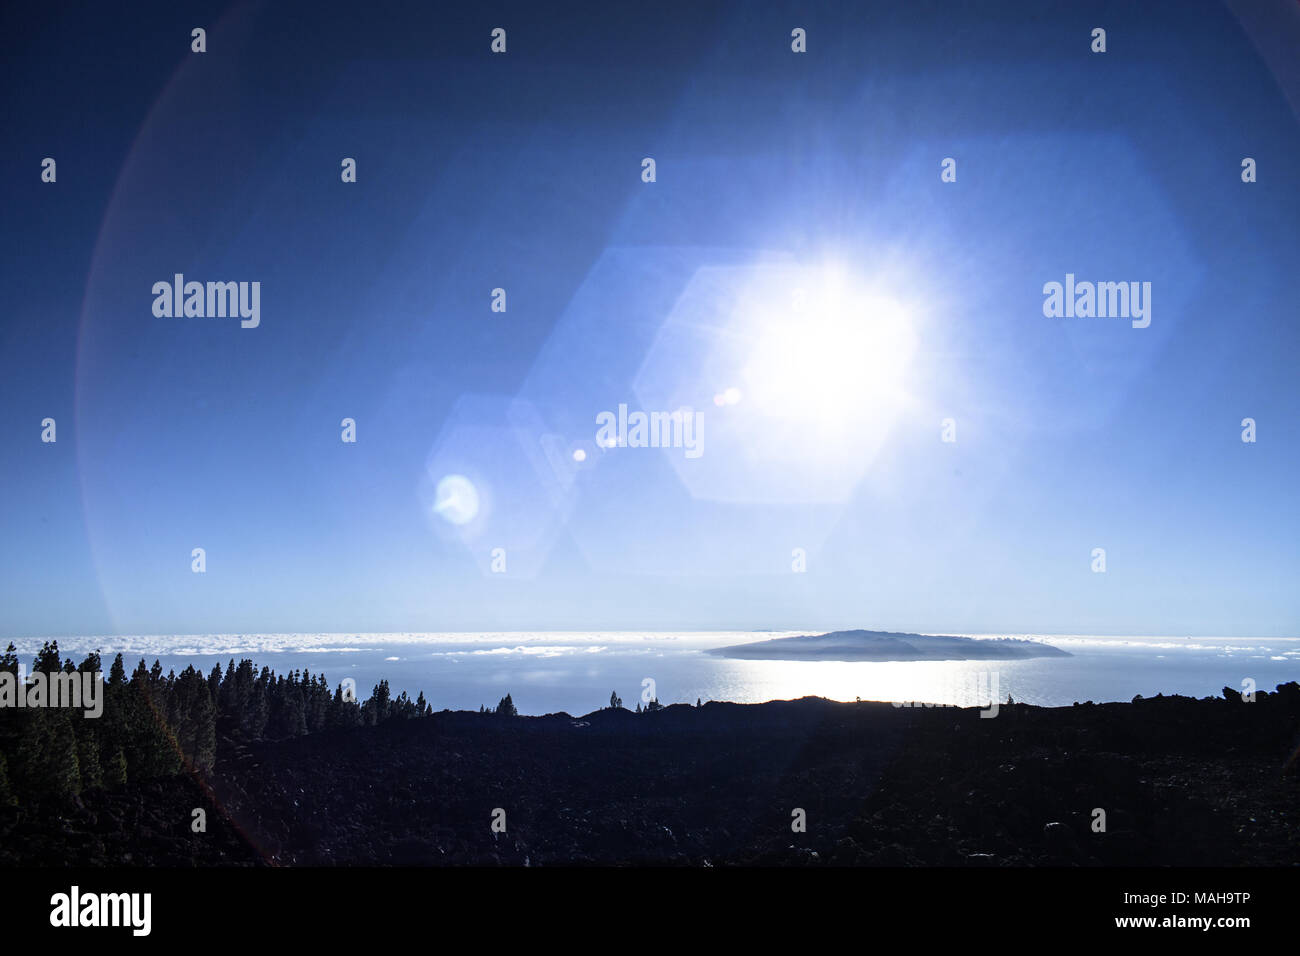 Teneriffa Mondlandschaft Stockbild